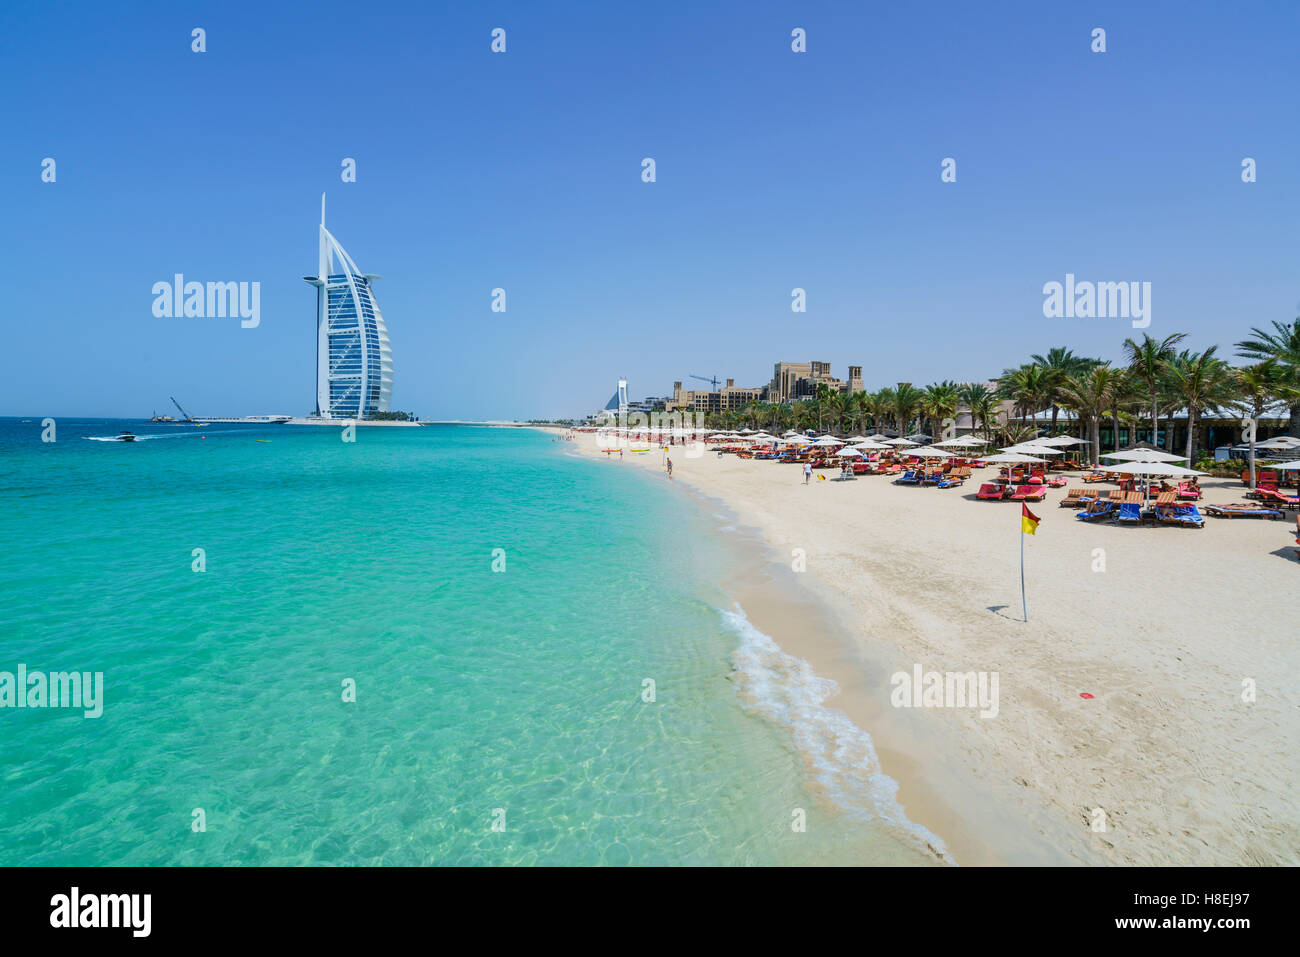 El Burj Al Arab, Jumeirah Beach, Dubai, Emiratos Árabes Unidos, Oriente Medio Foto de stock